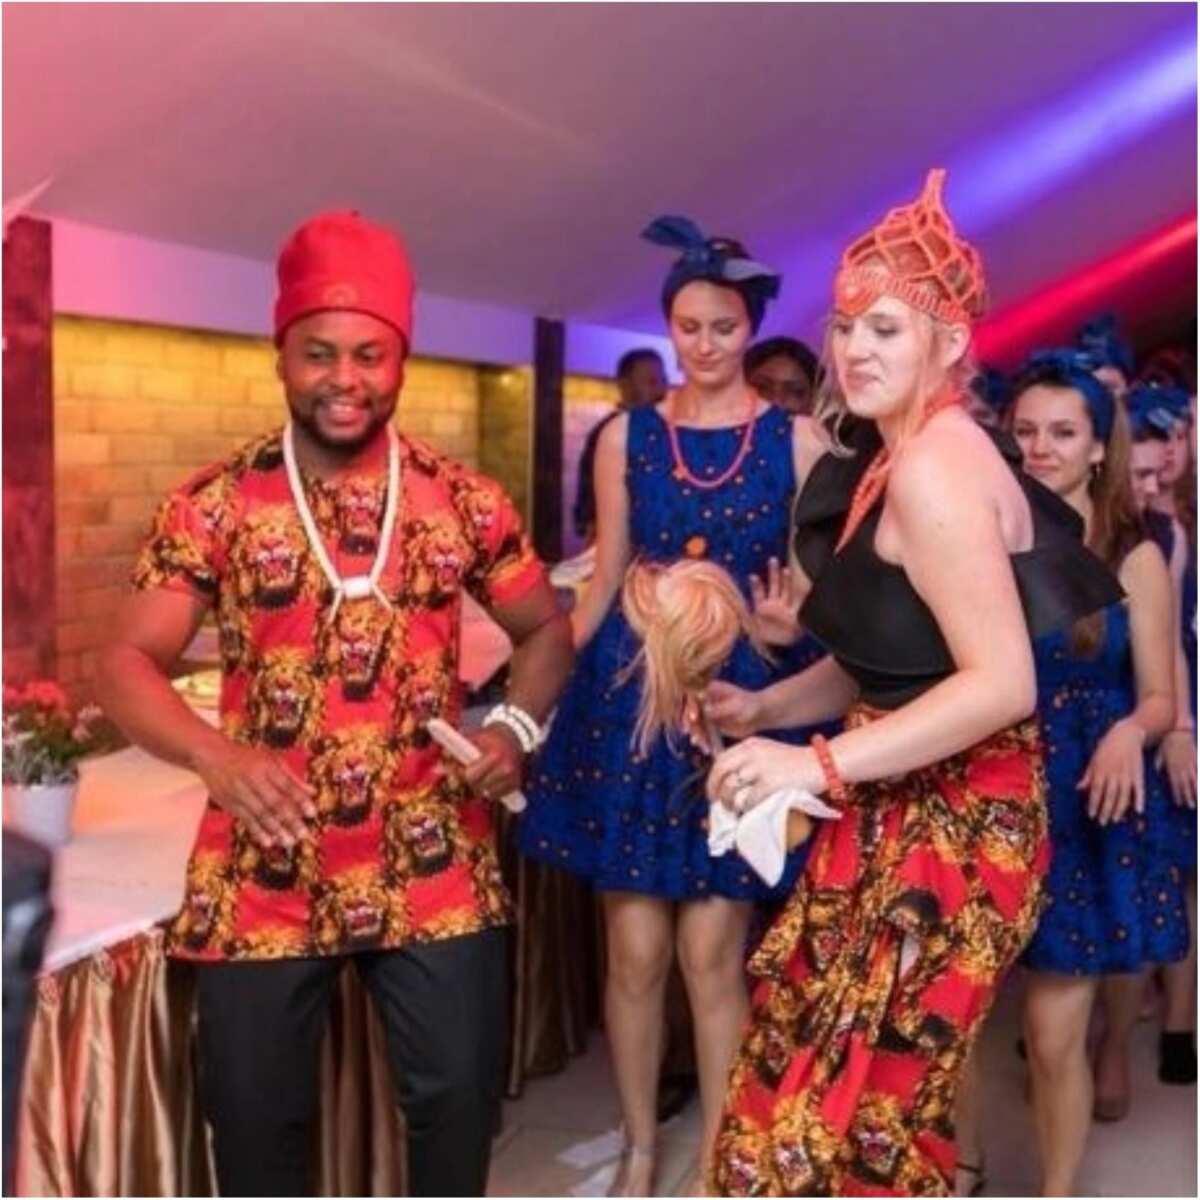 Pretty Oyinbo bride weds Nigerian man in her Igbo traditional attire (photos)